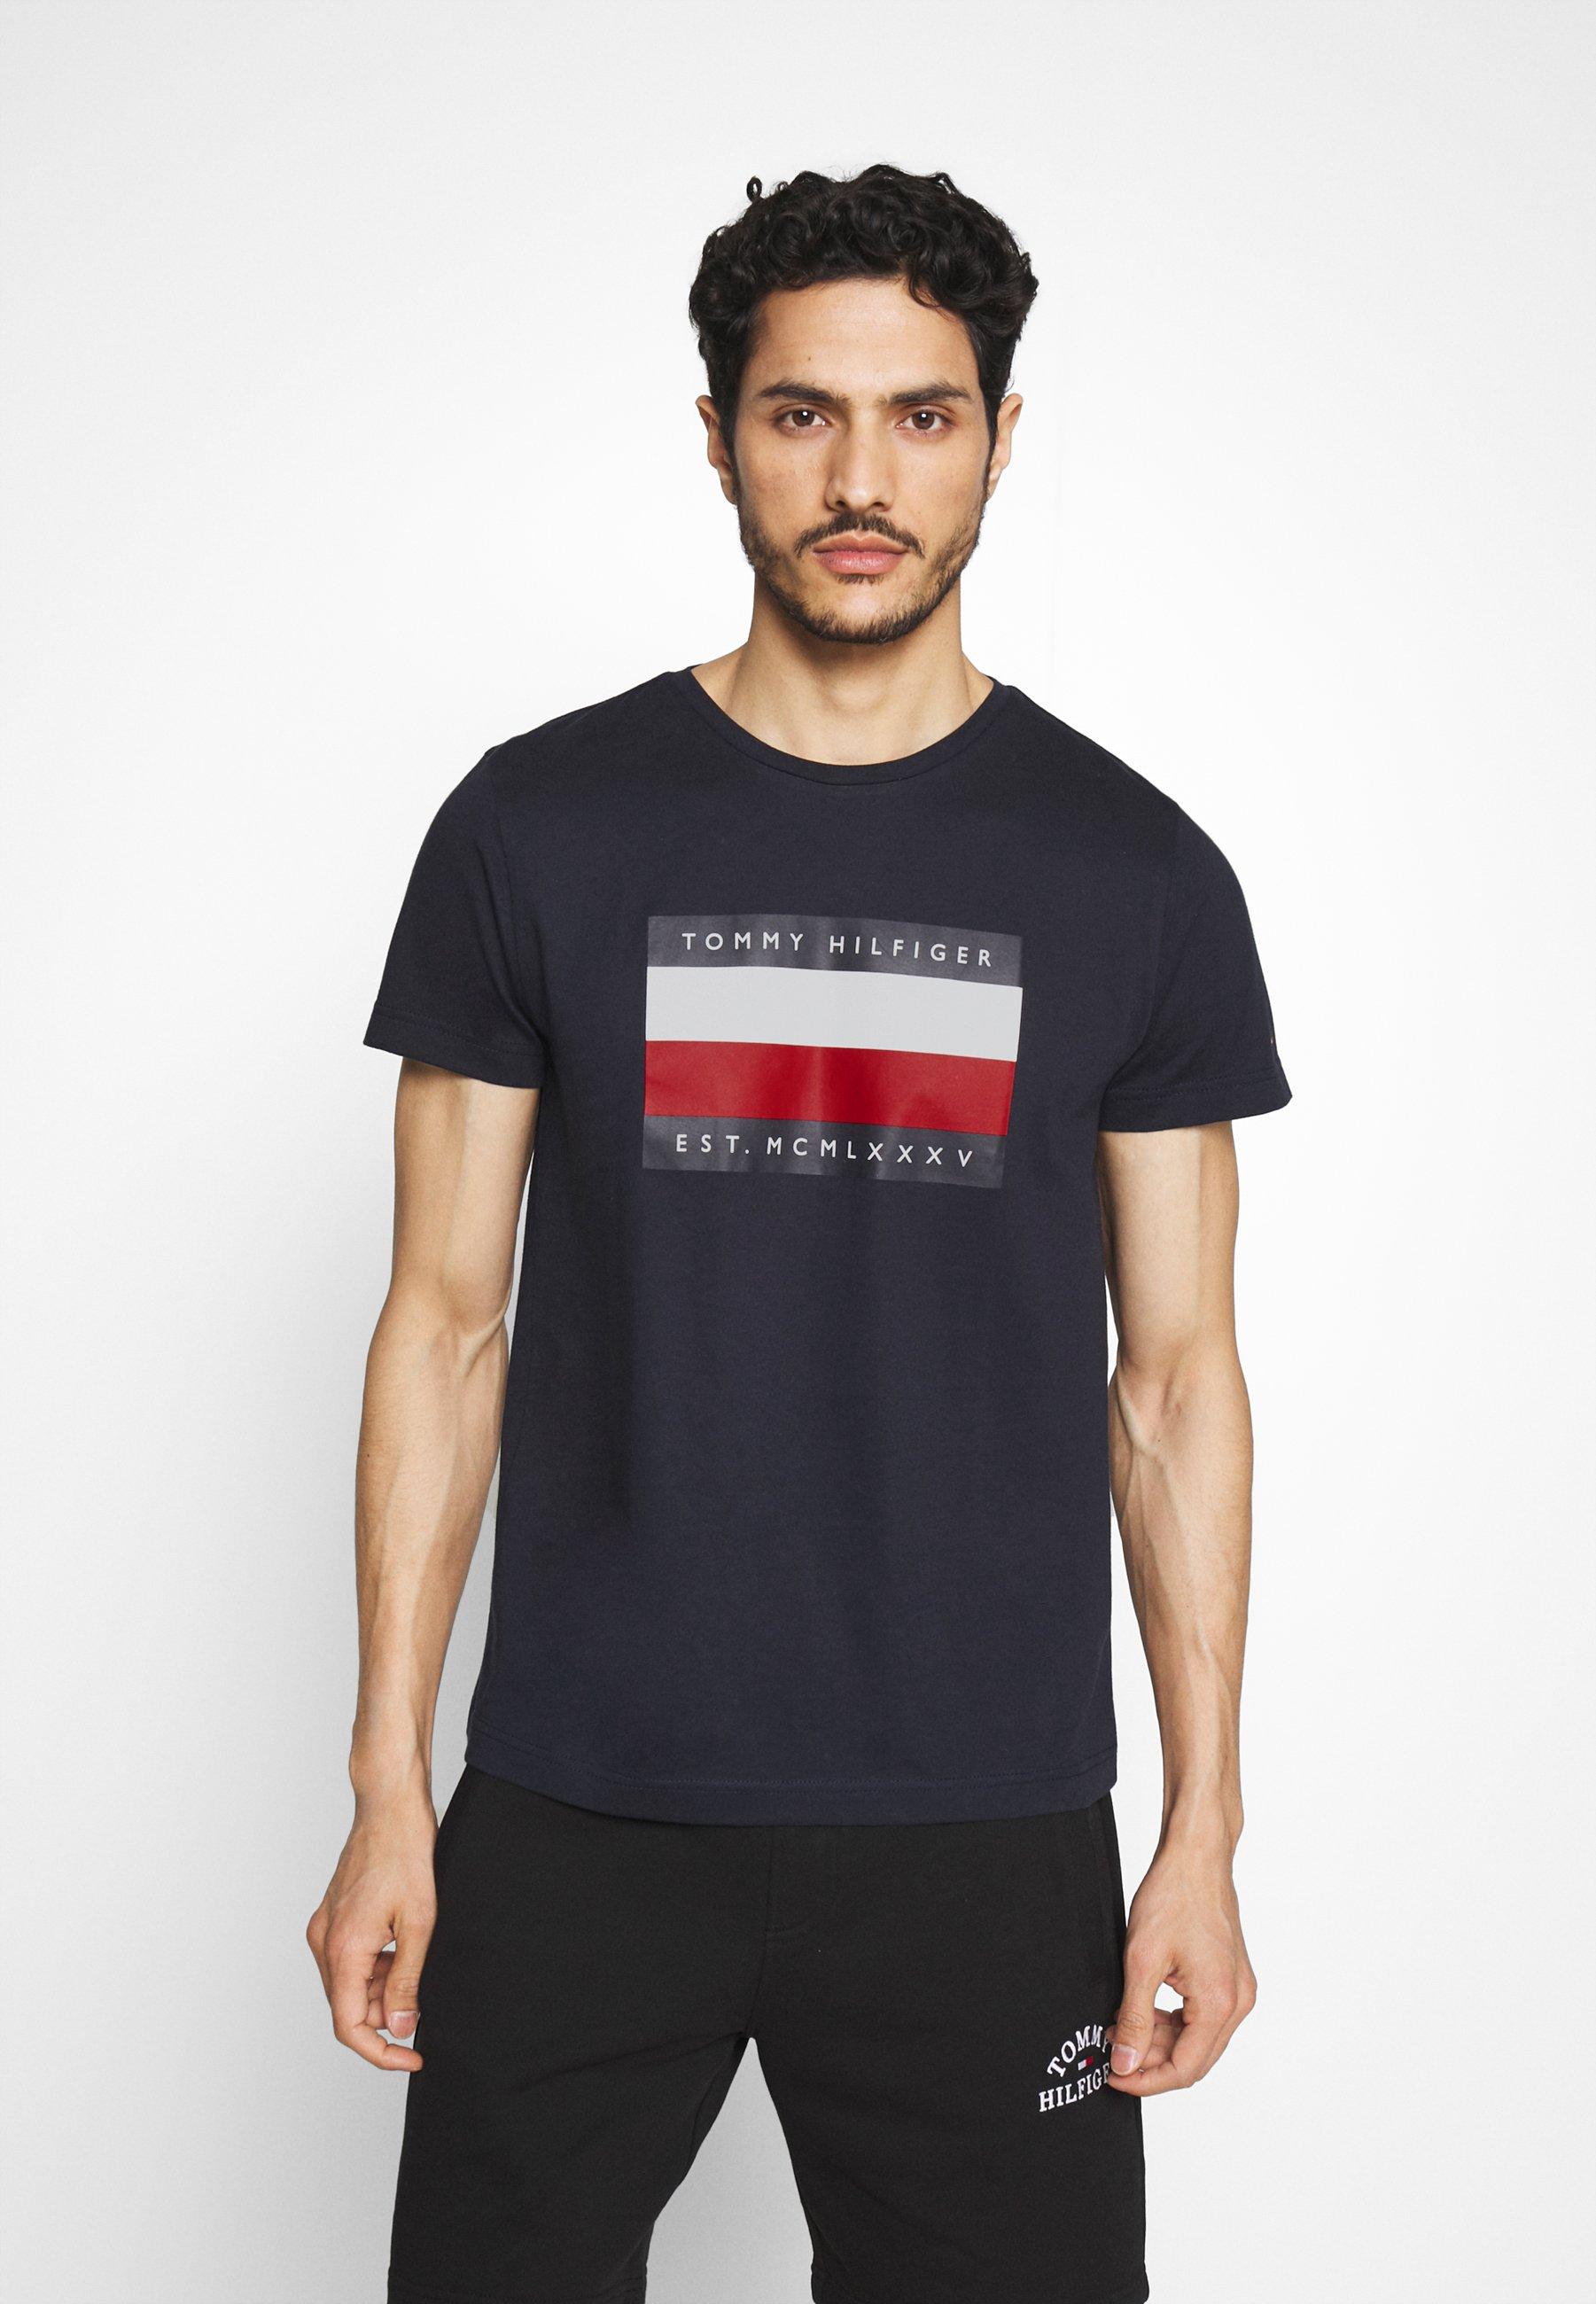 T shirt da uomo | Scoprile su Zalando